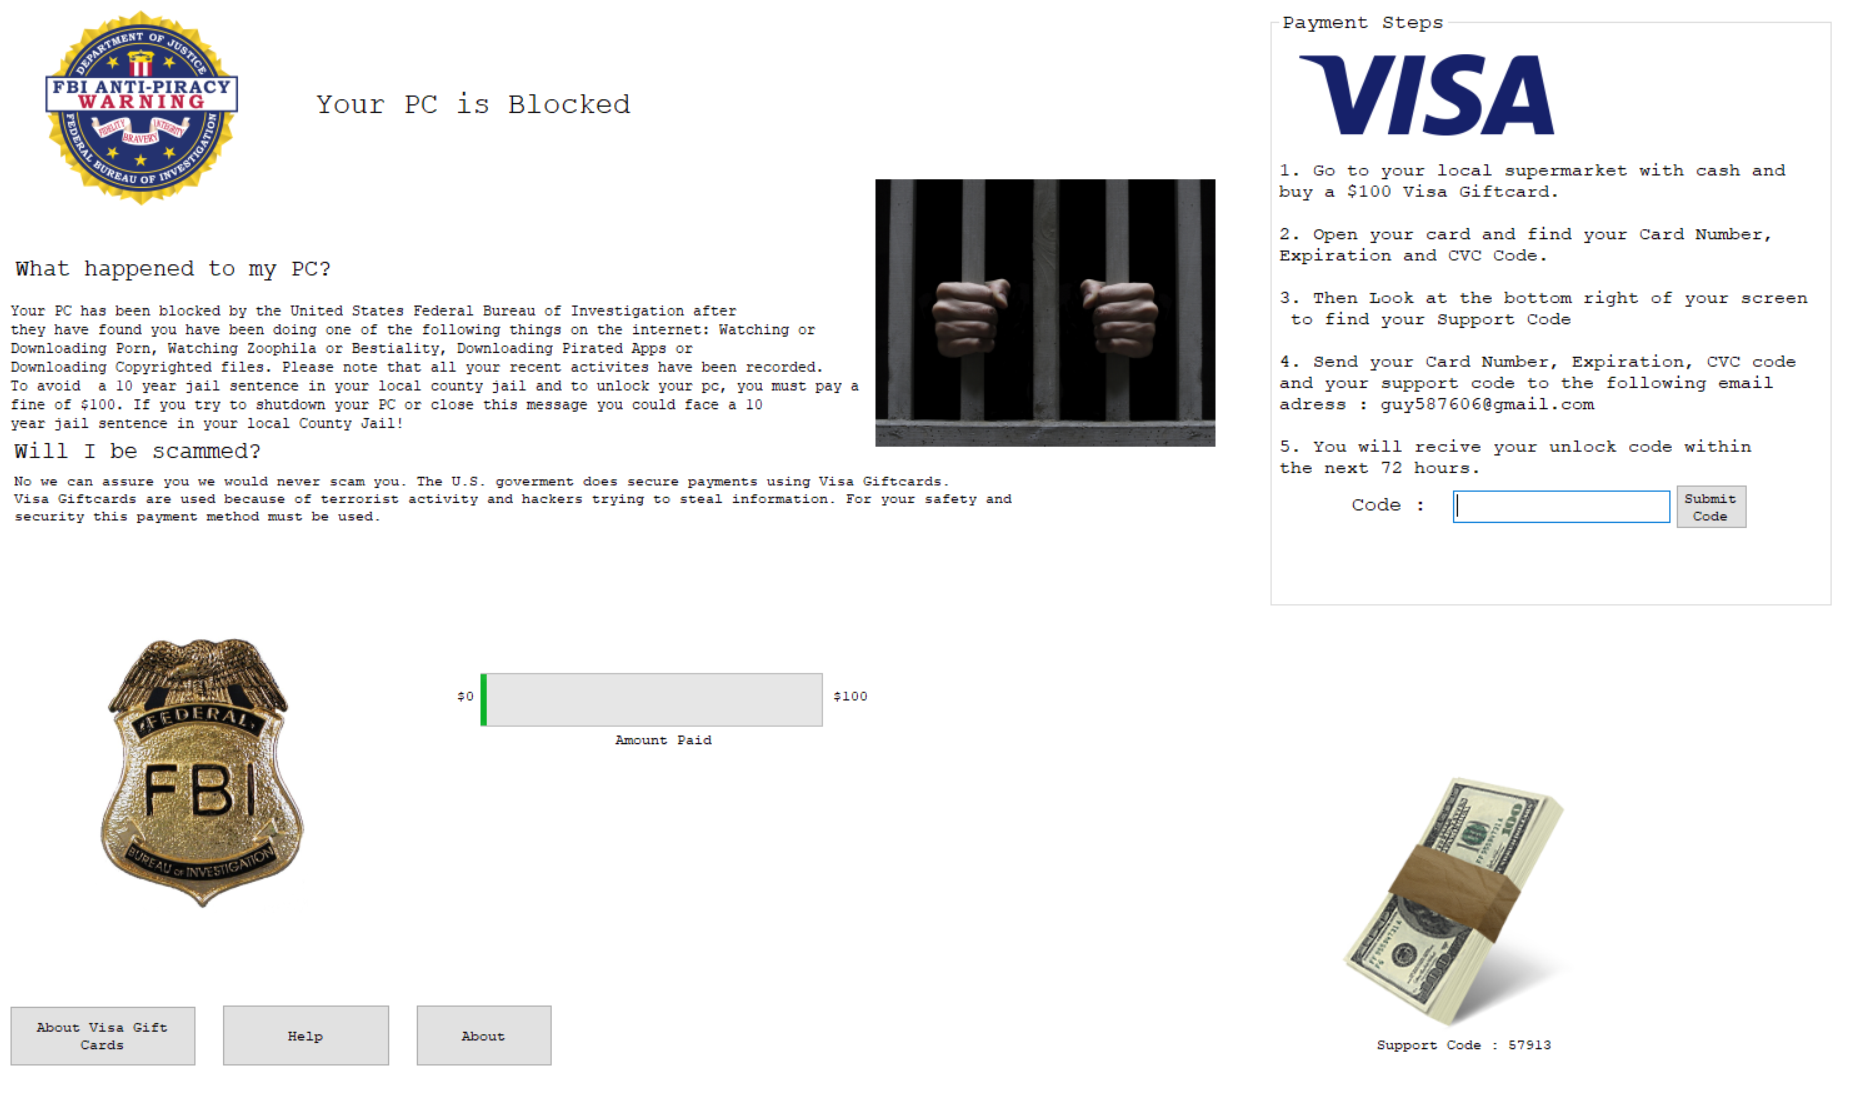 FBI screen locker trojan poses as Fortnite mod – SonicWall